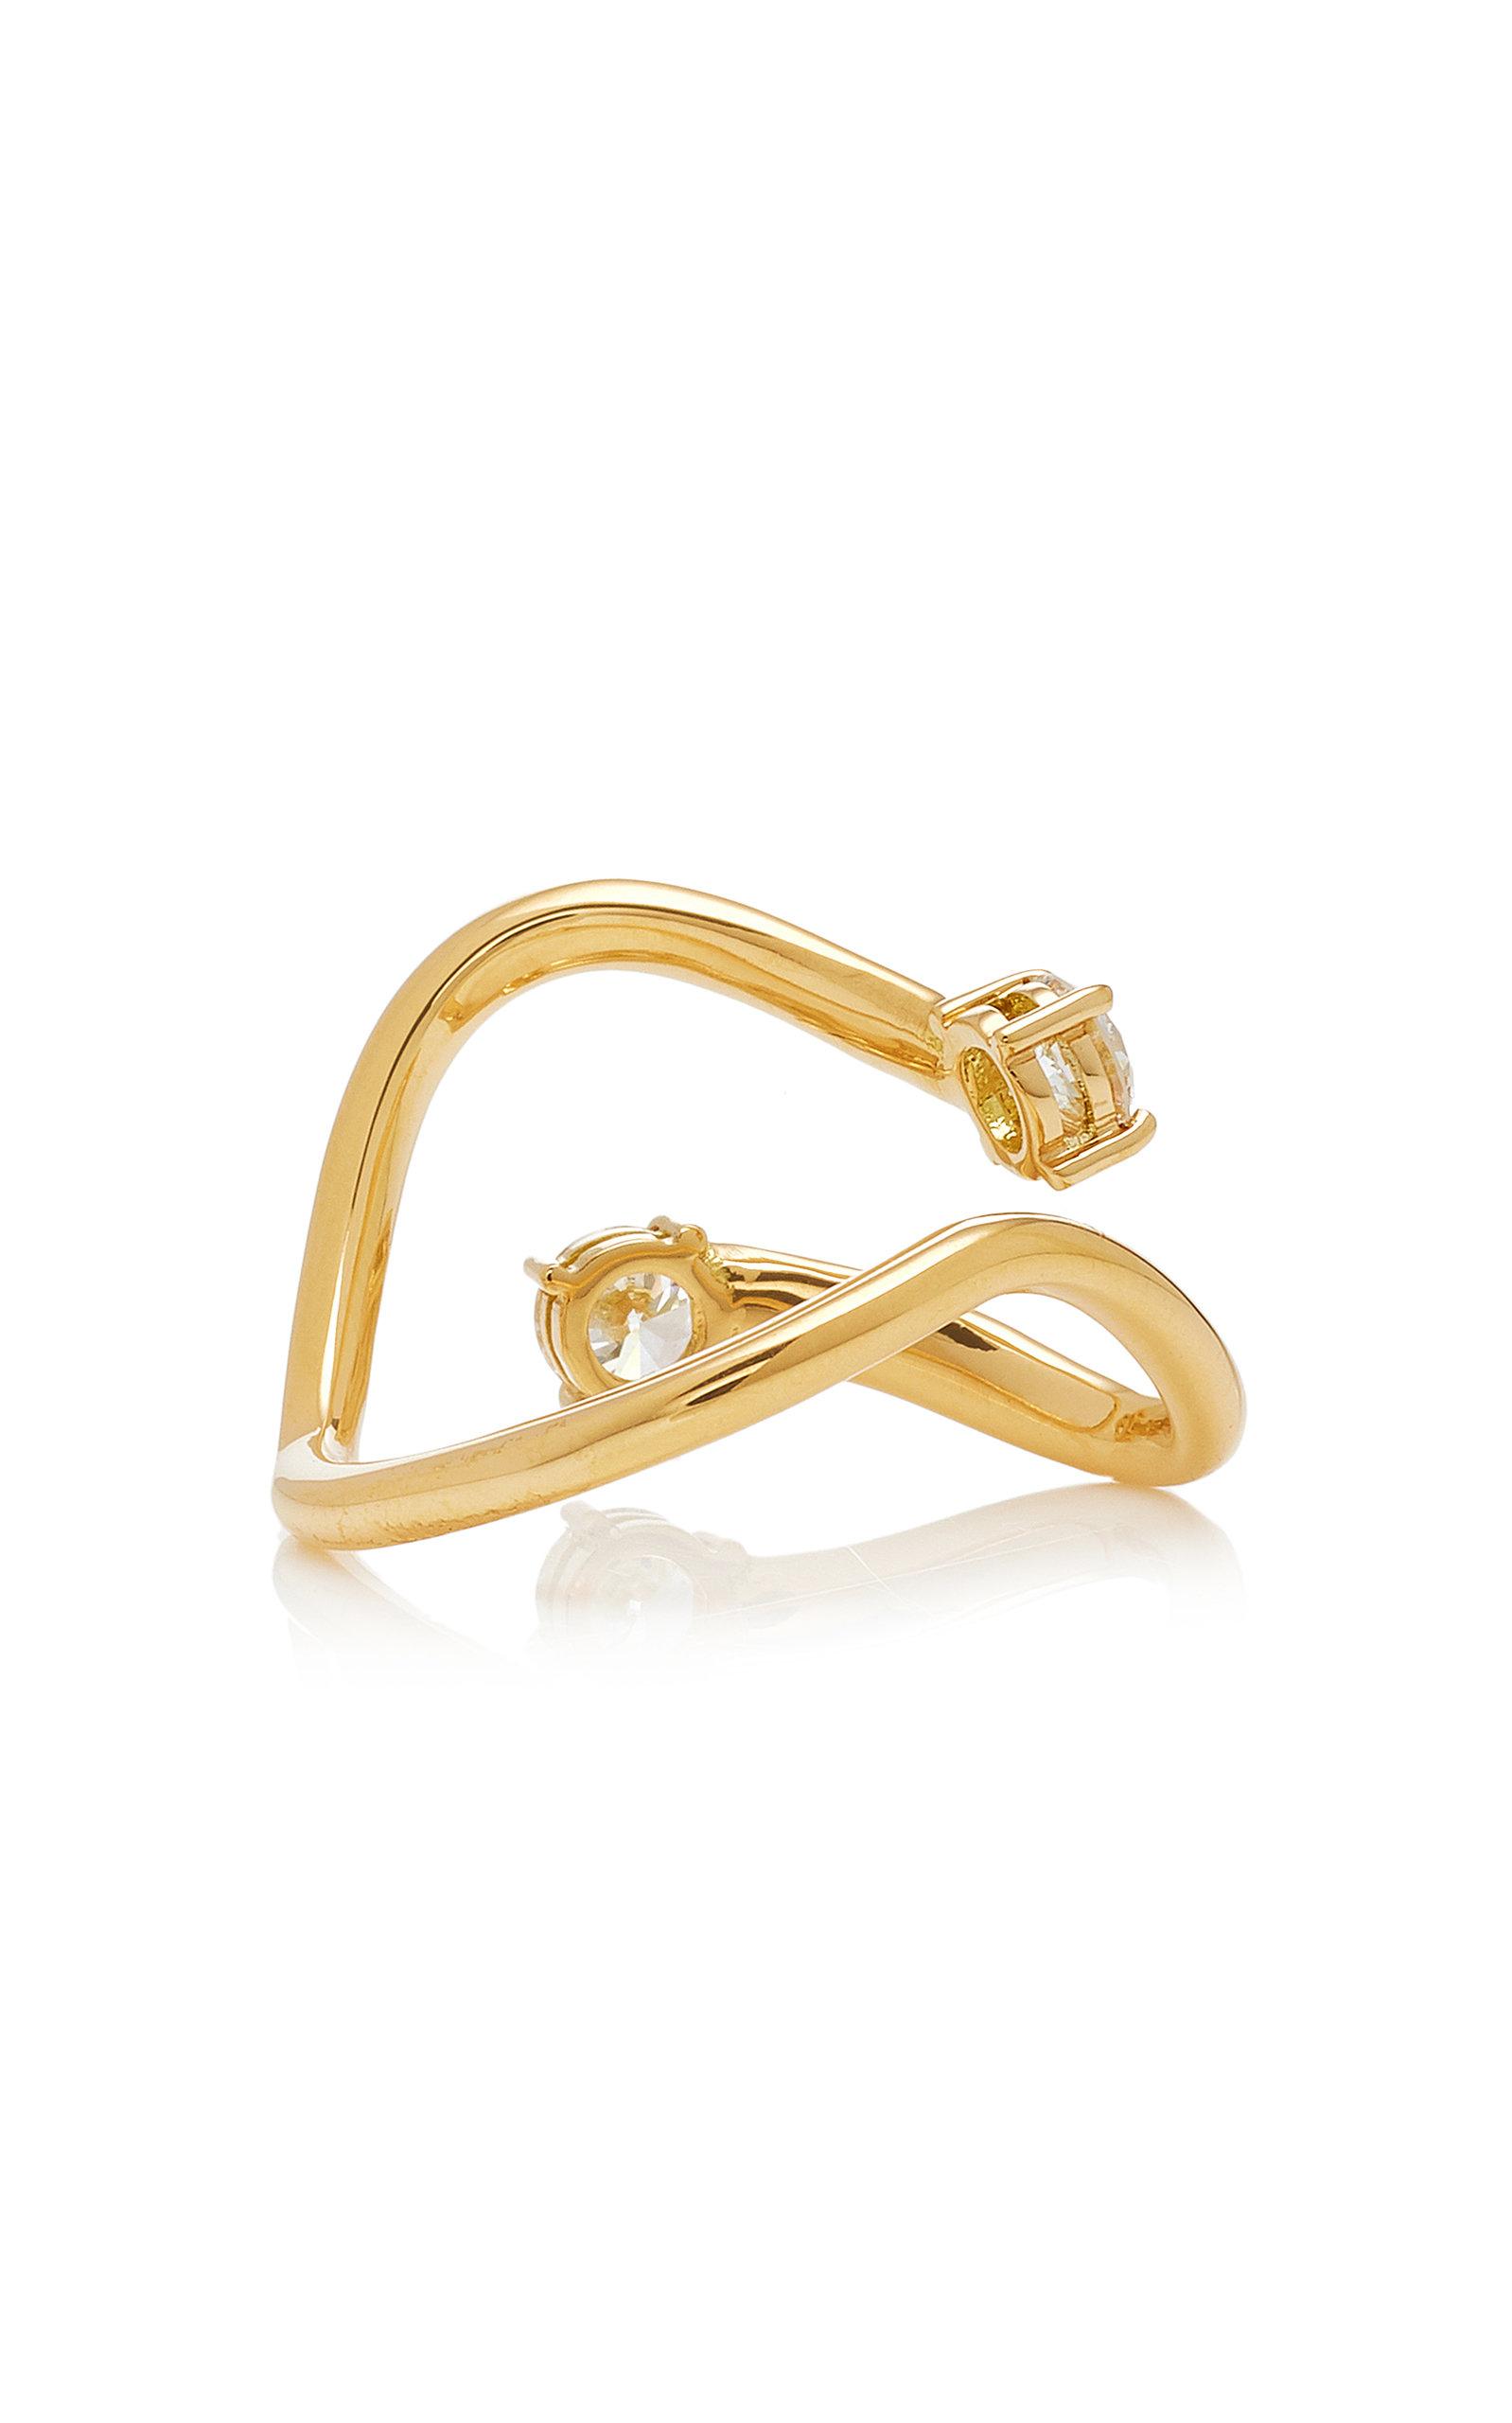 Aria Skye Gold Ring Melissa Kaye tuDq8i